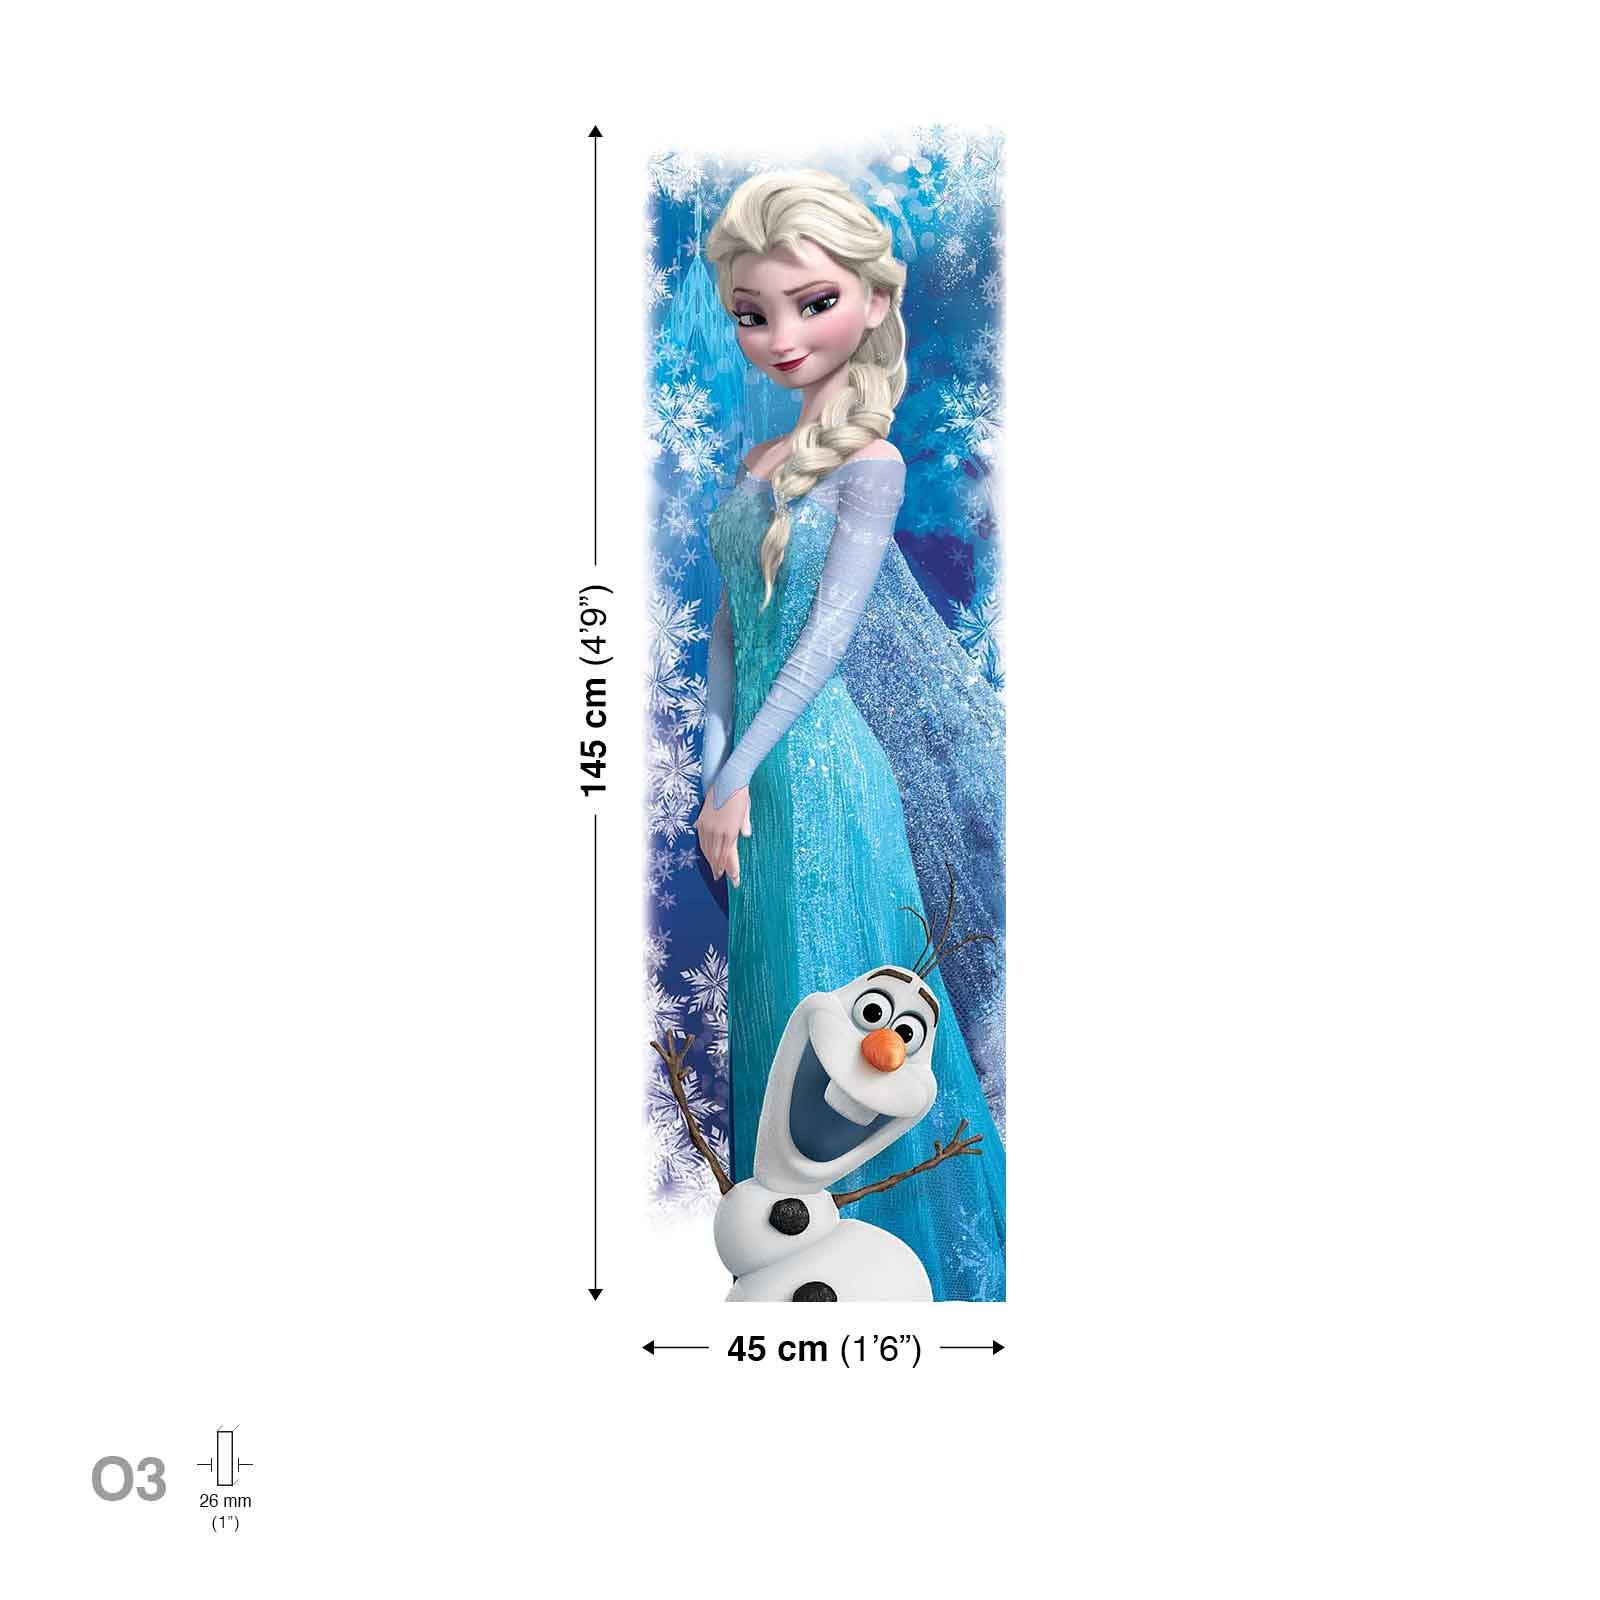 tableau 145x45 cm la reine des neiges des prix 50 moins. Black Bedroom Furniture Sets. Home Design Ideas